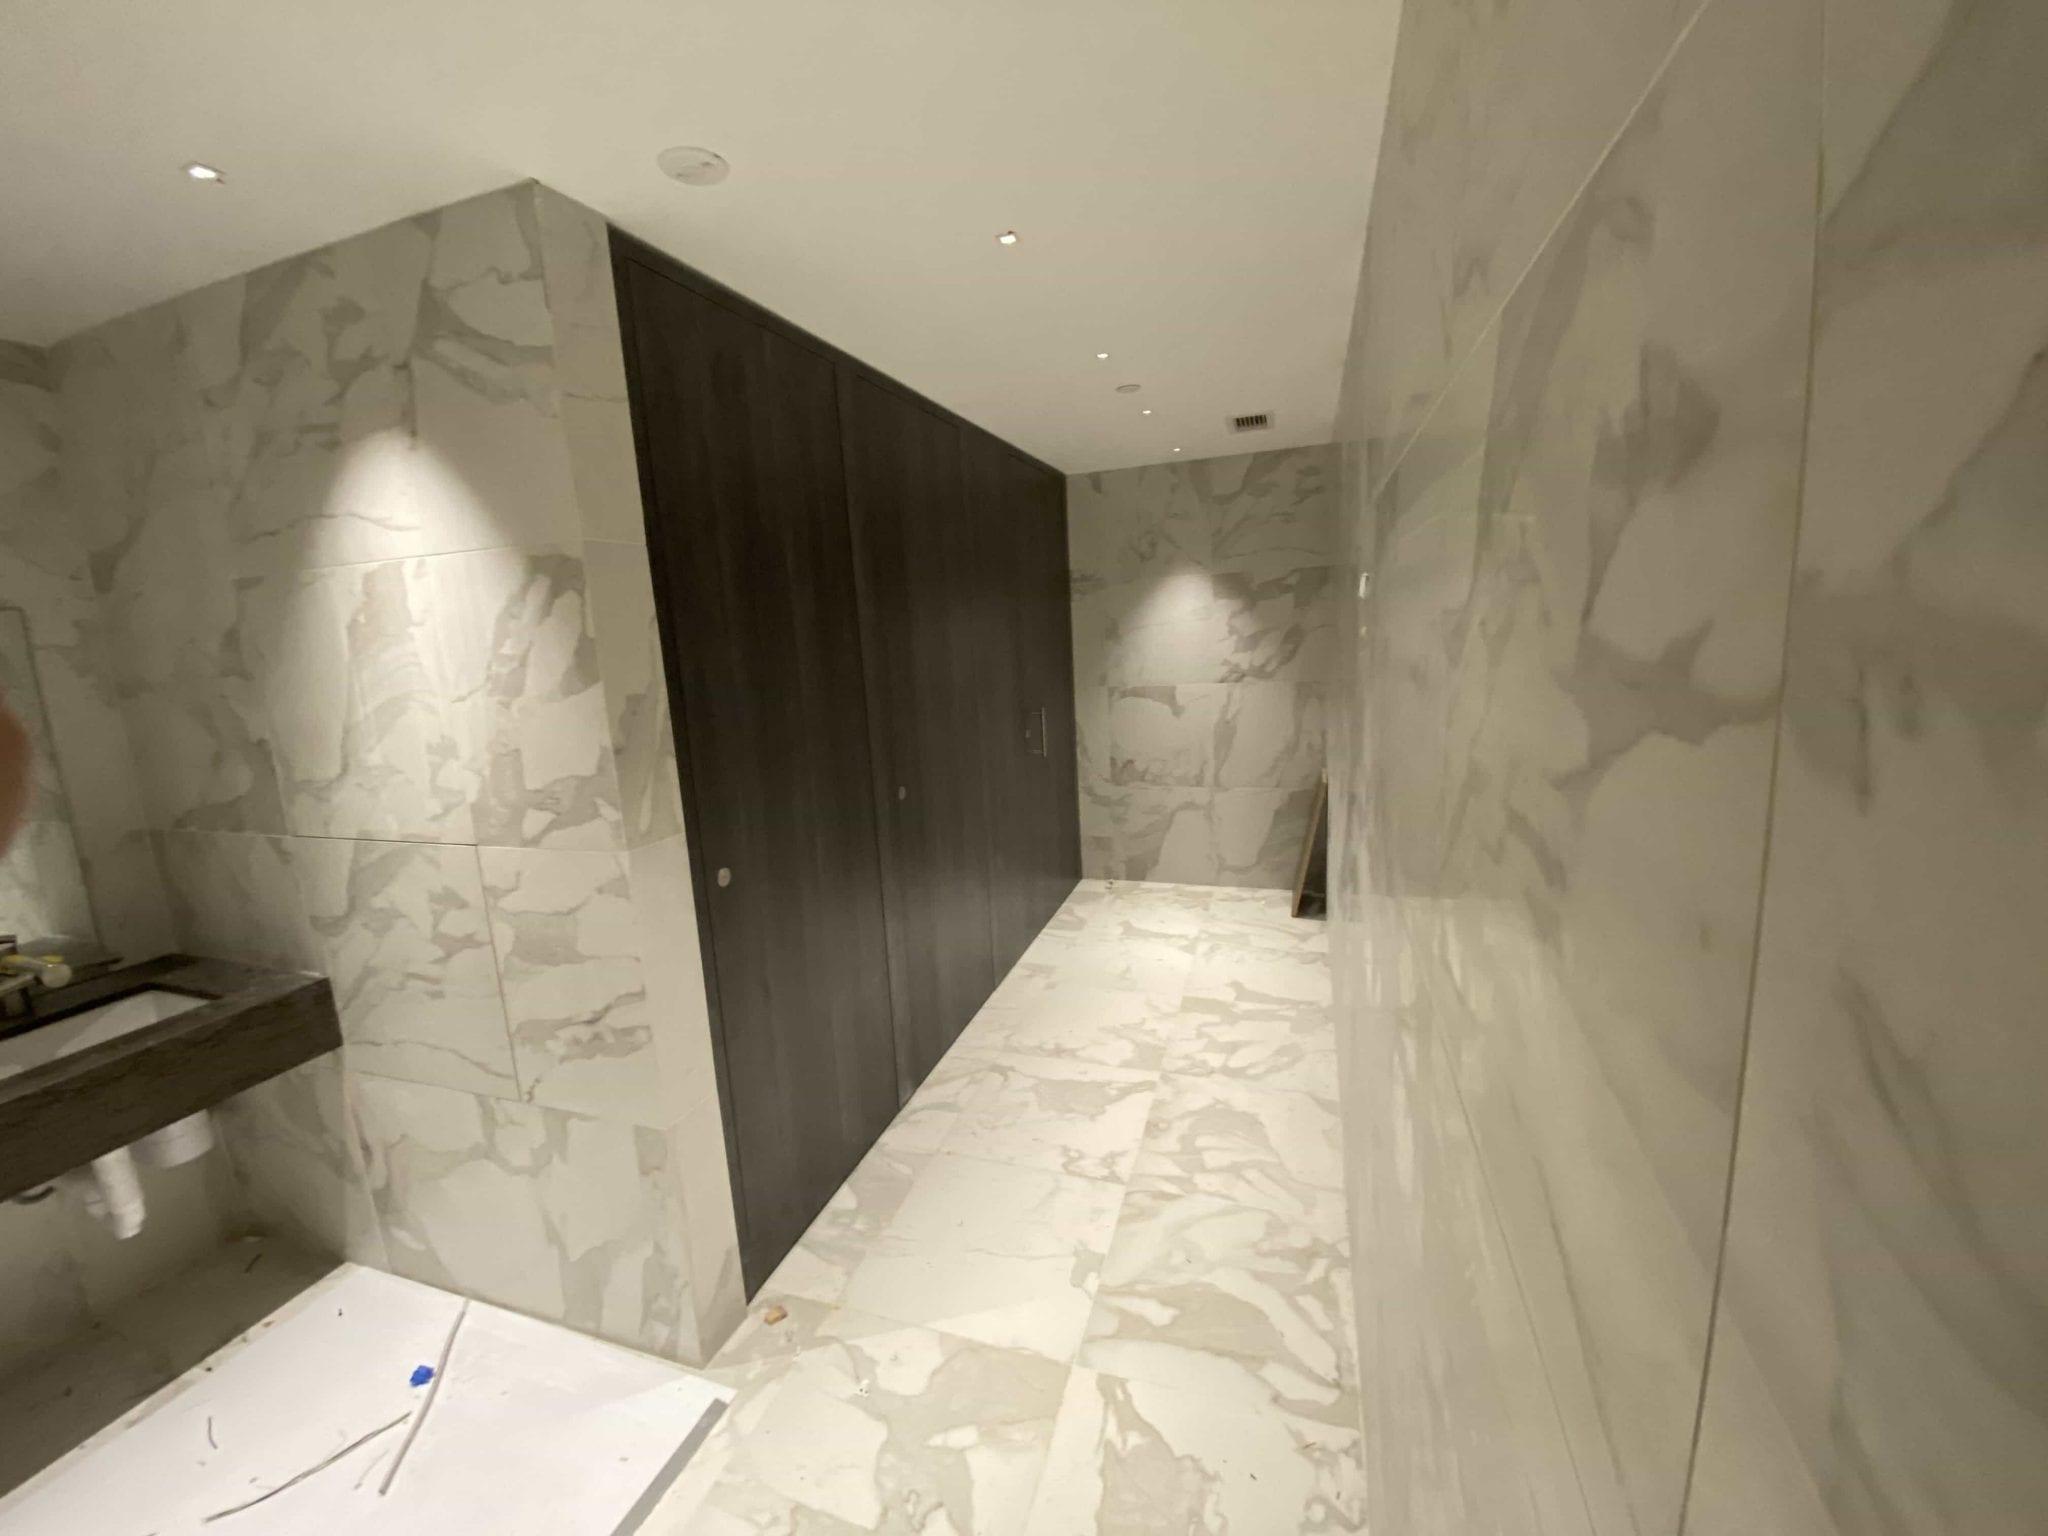 Thrislington Toilet partition install photo